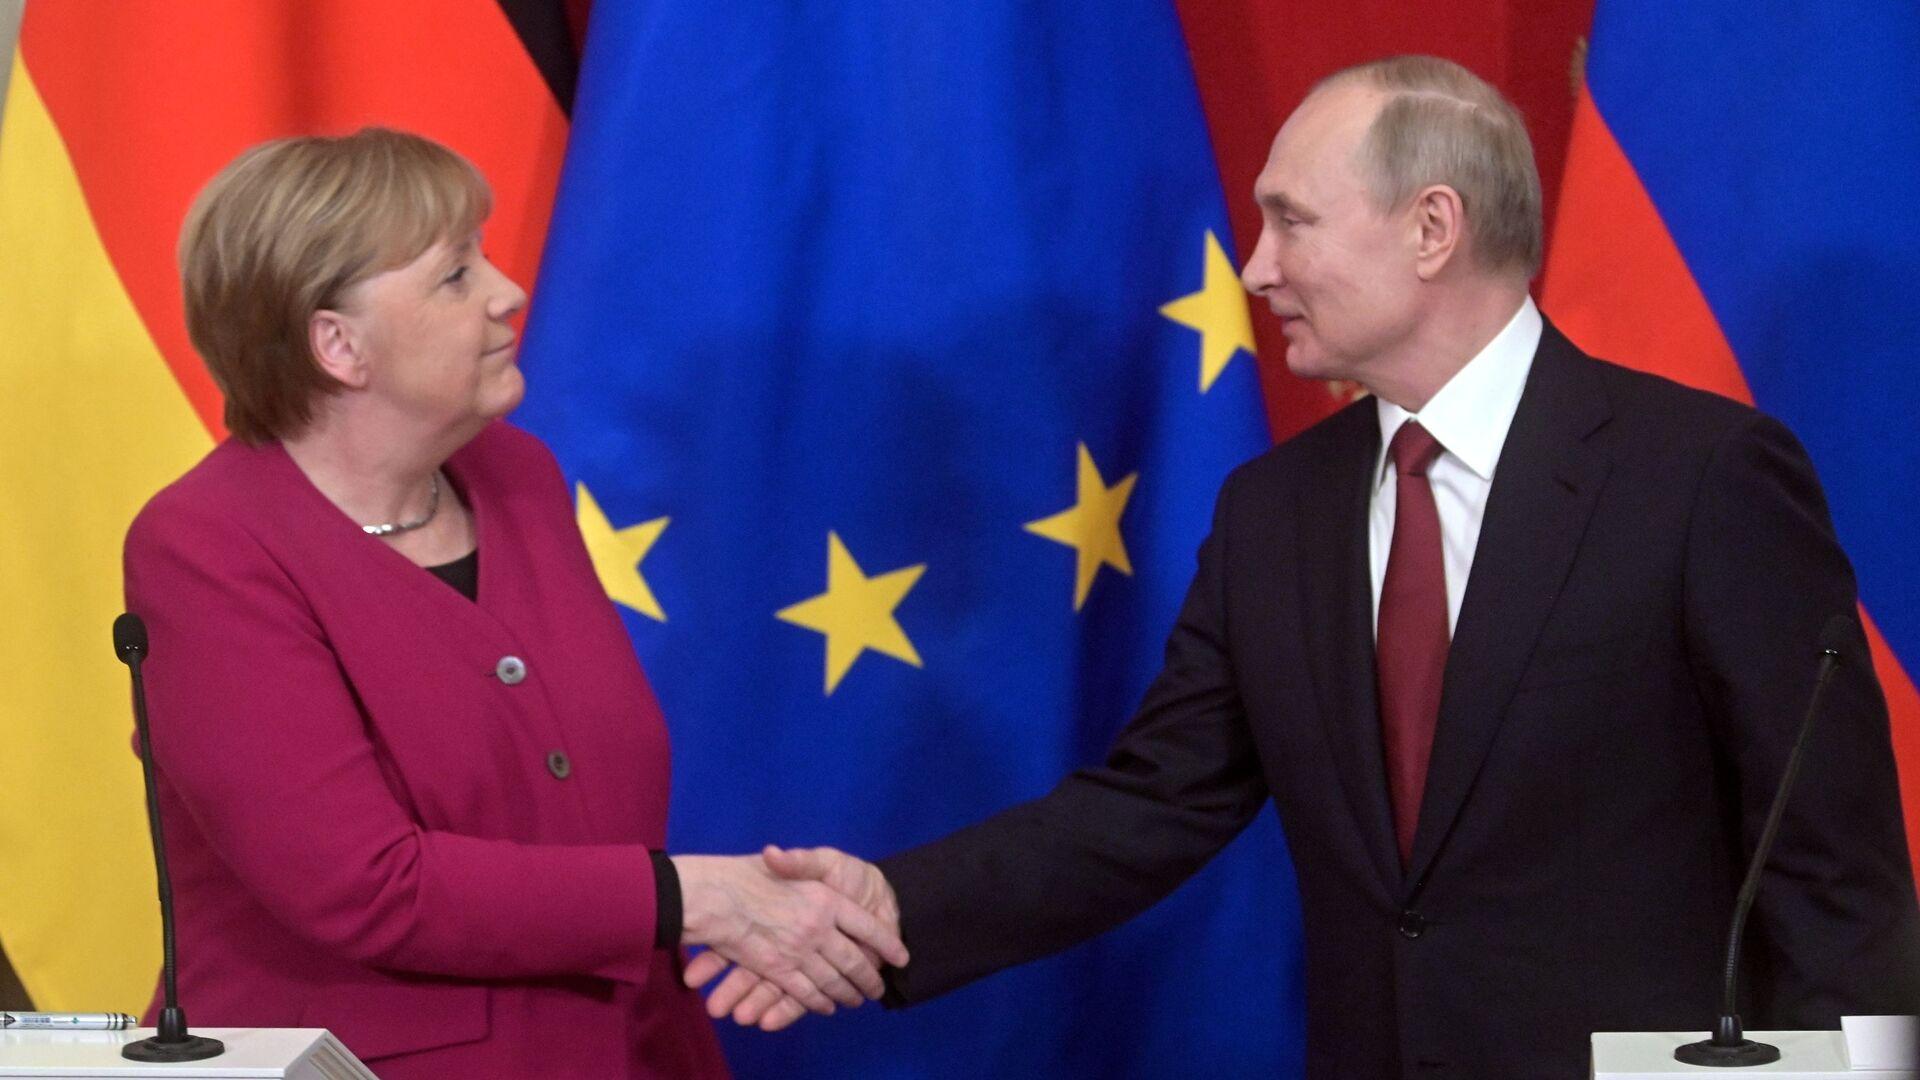 La canciller alemana, Angela Merkel, estrecha la mano del presidente ruso, Vladímir Putin - Sputnik Mundo, 1920, 08.04.2021